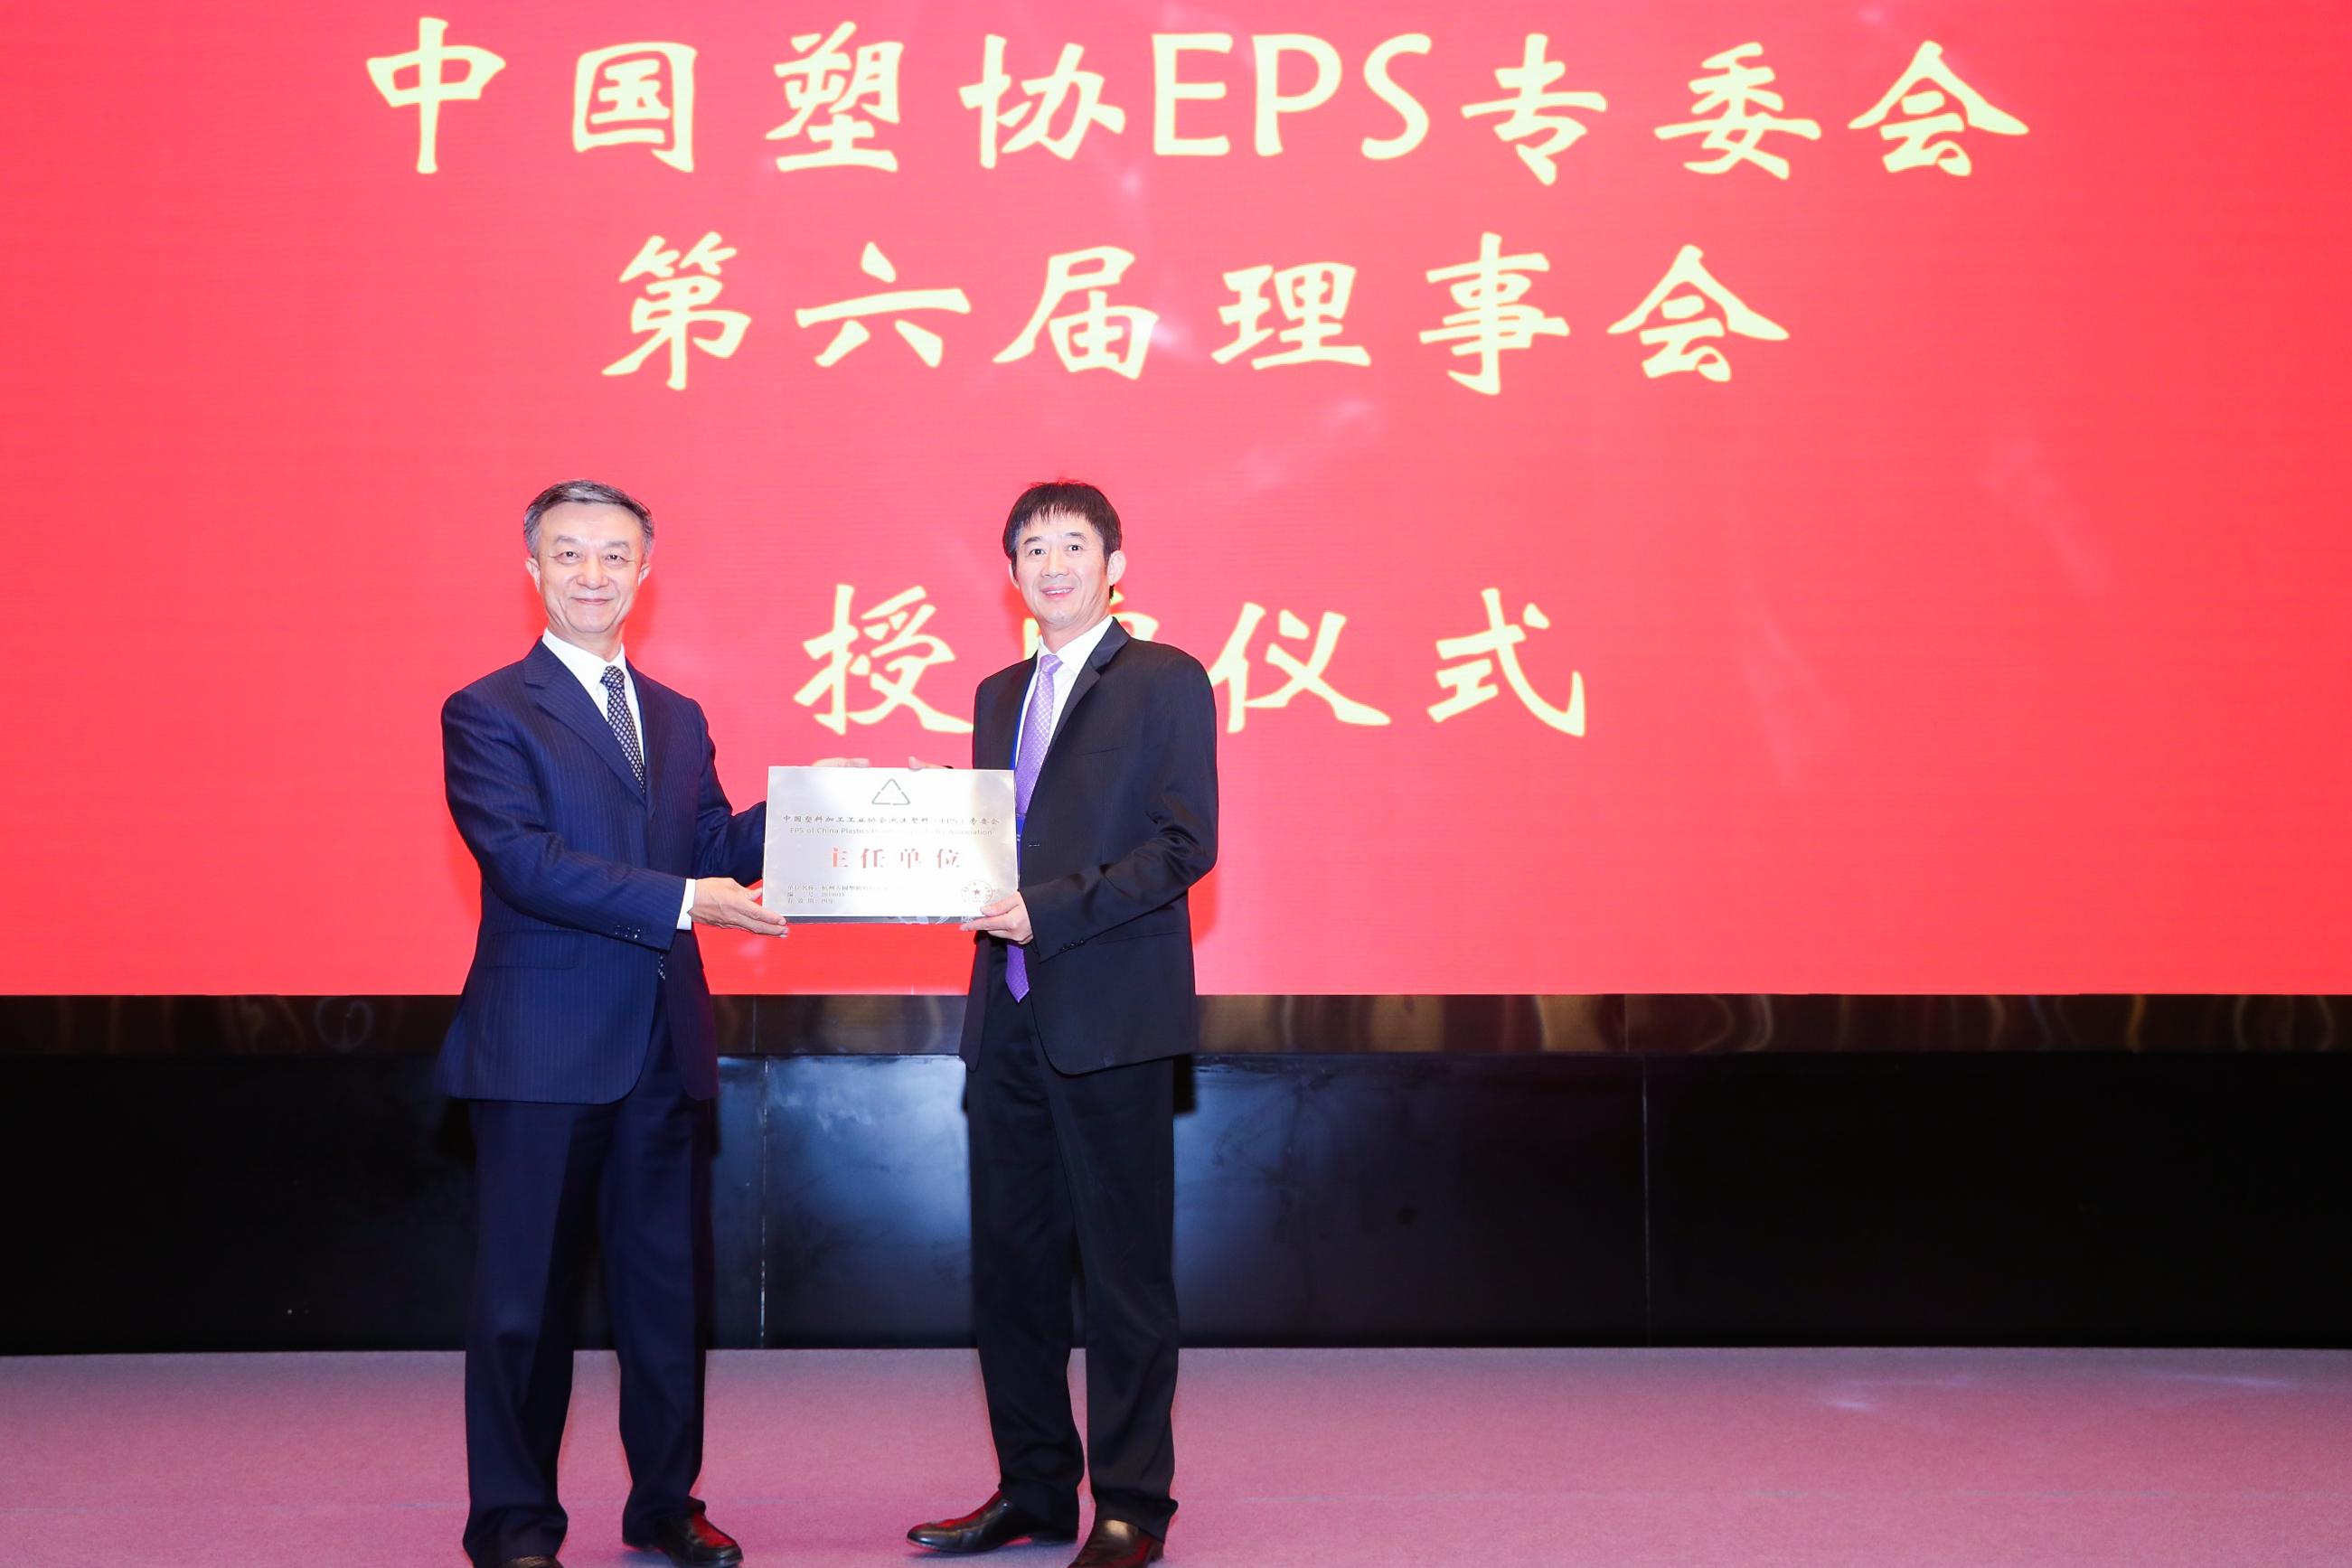 Fangyuan公司的主人袁国庆先生,自2019年以来颁发了中国塑料加工行业协会的EPS委员会主席。